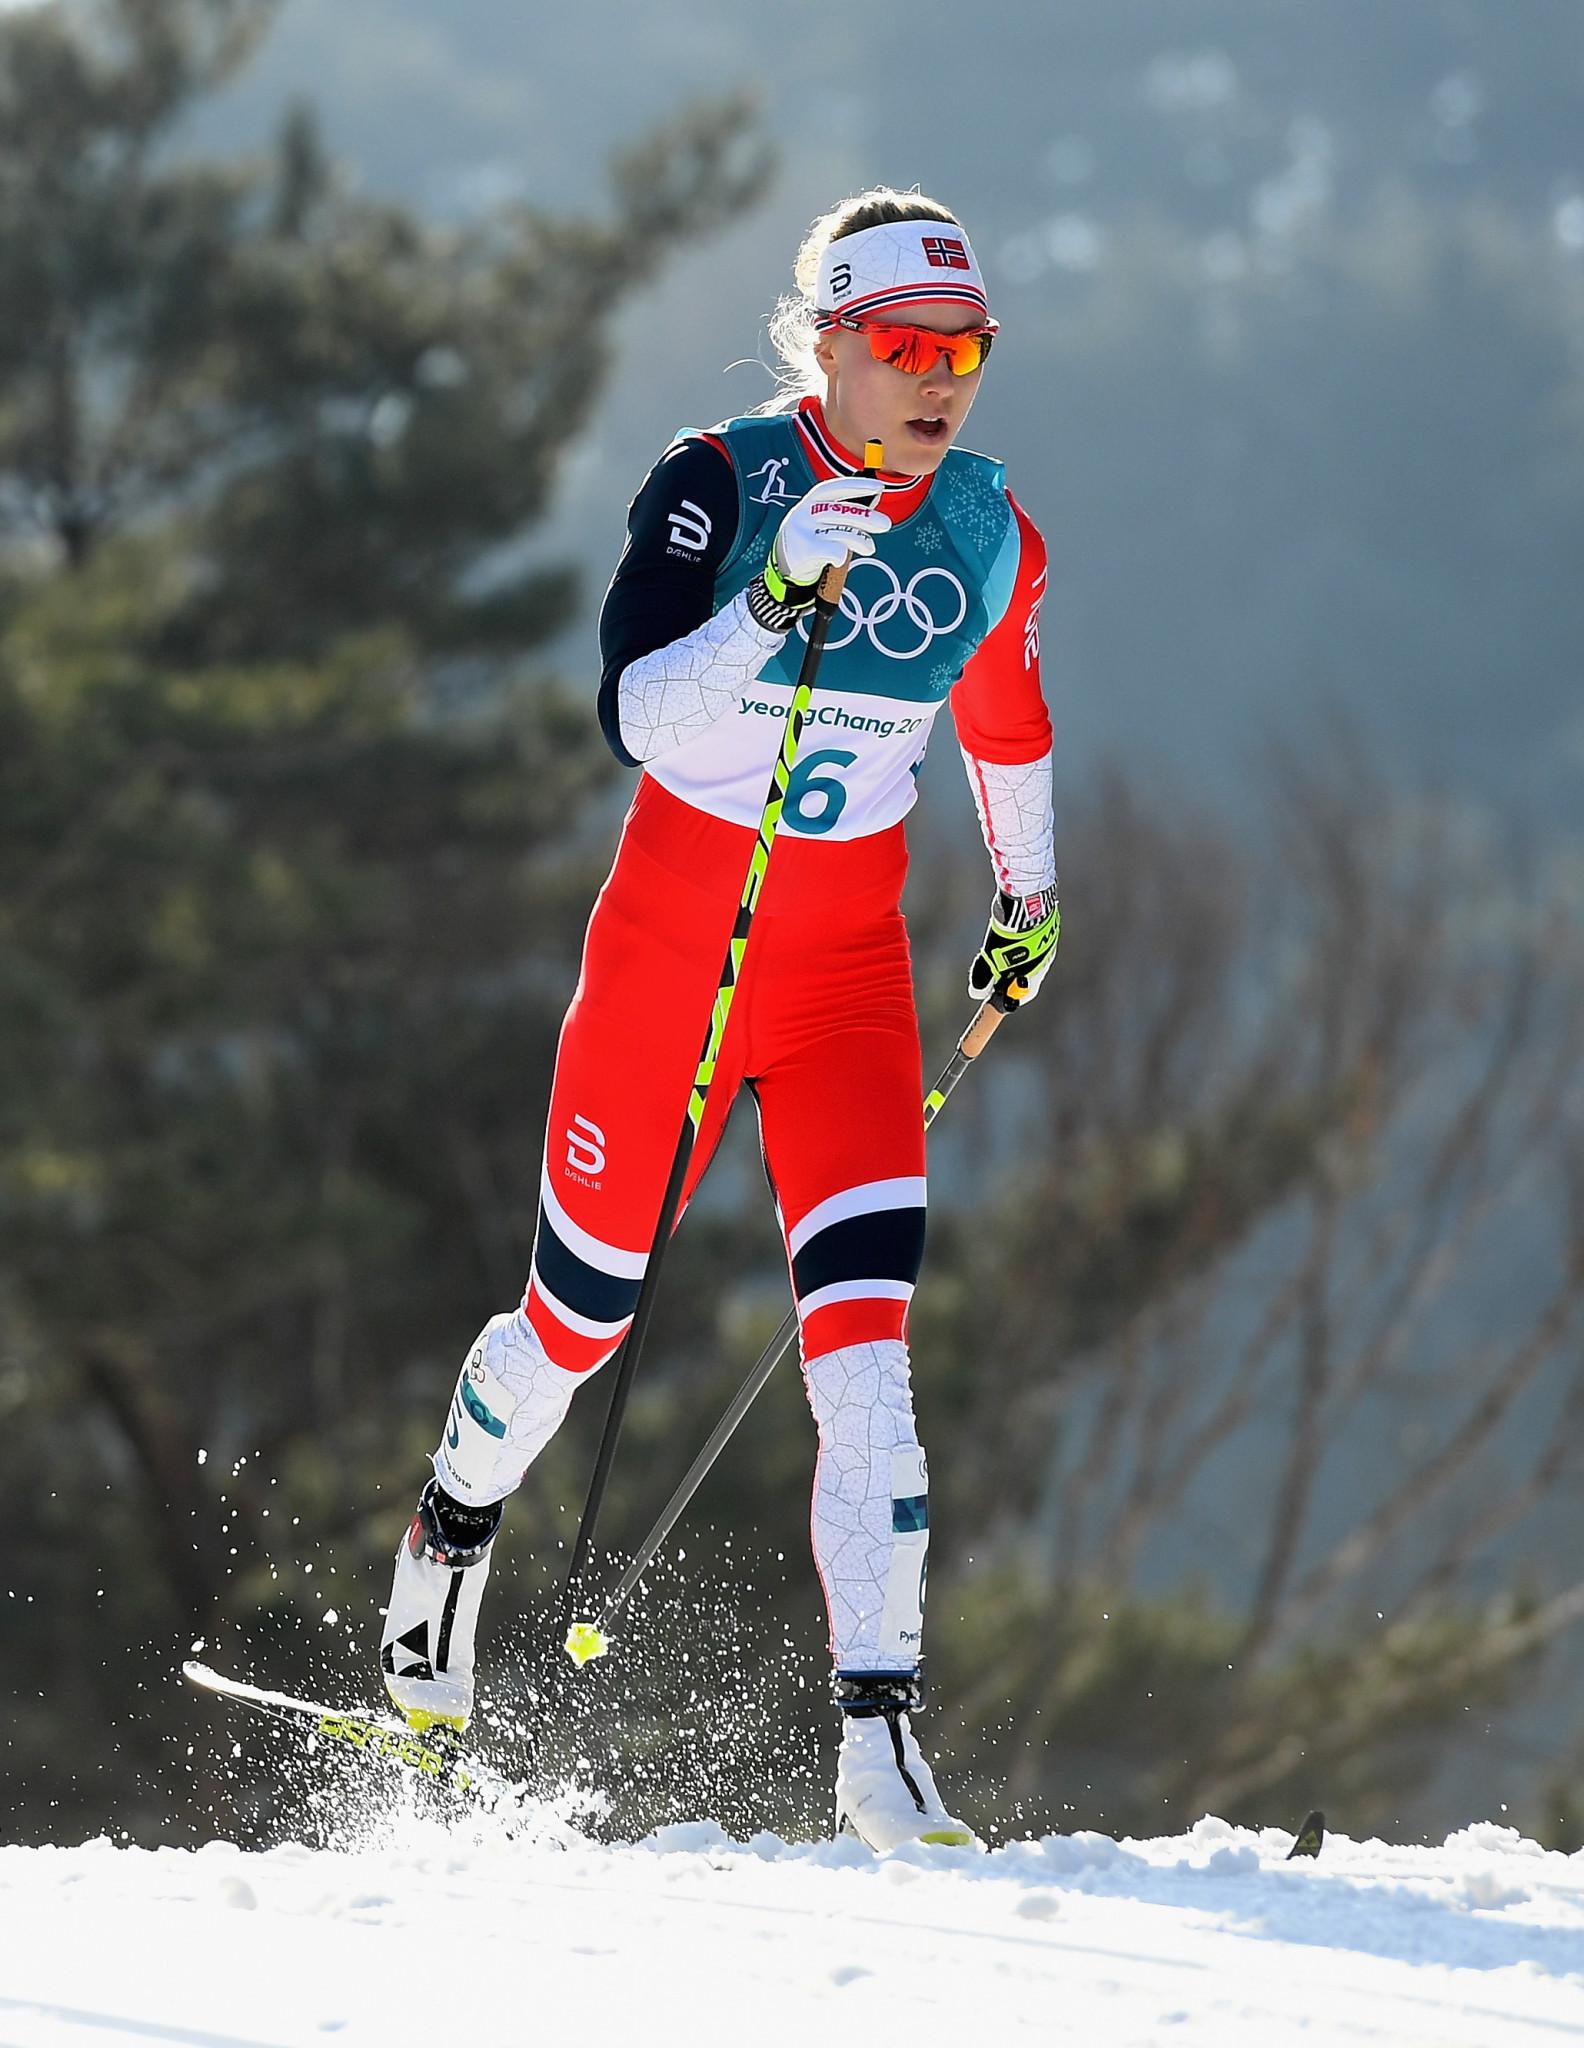 Ragnhild Haga won two Olympic titles at Pyeongchang 2018 ©Getty Images